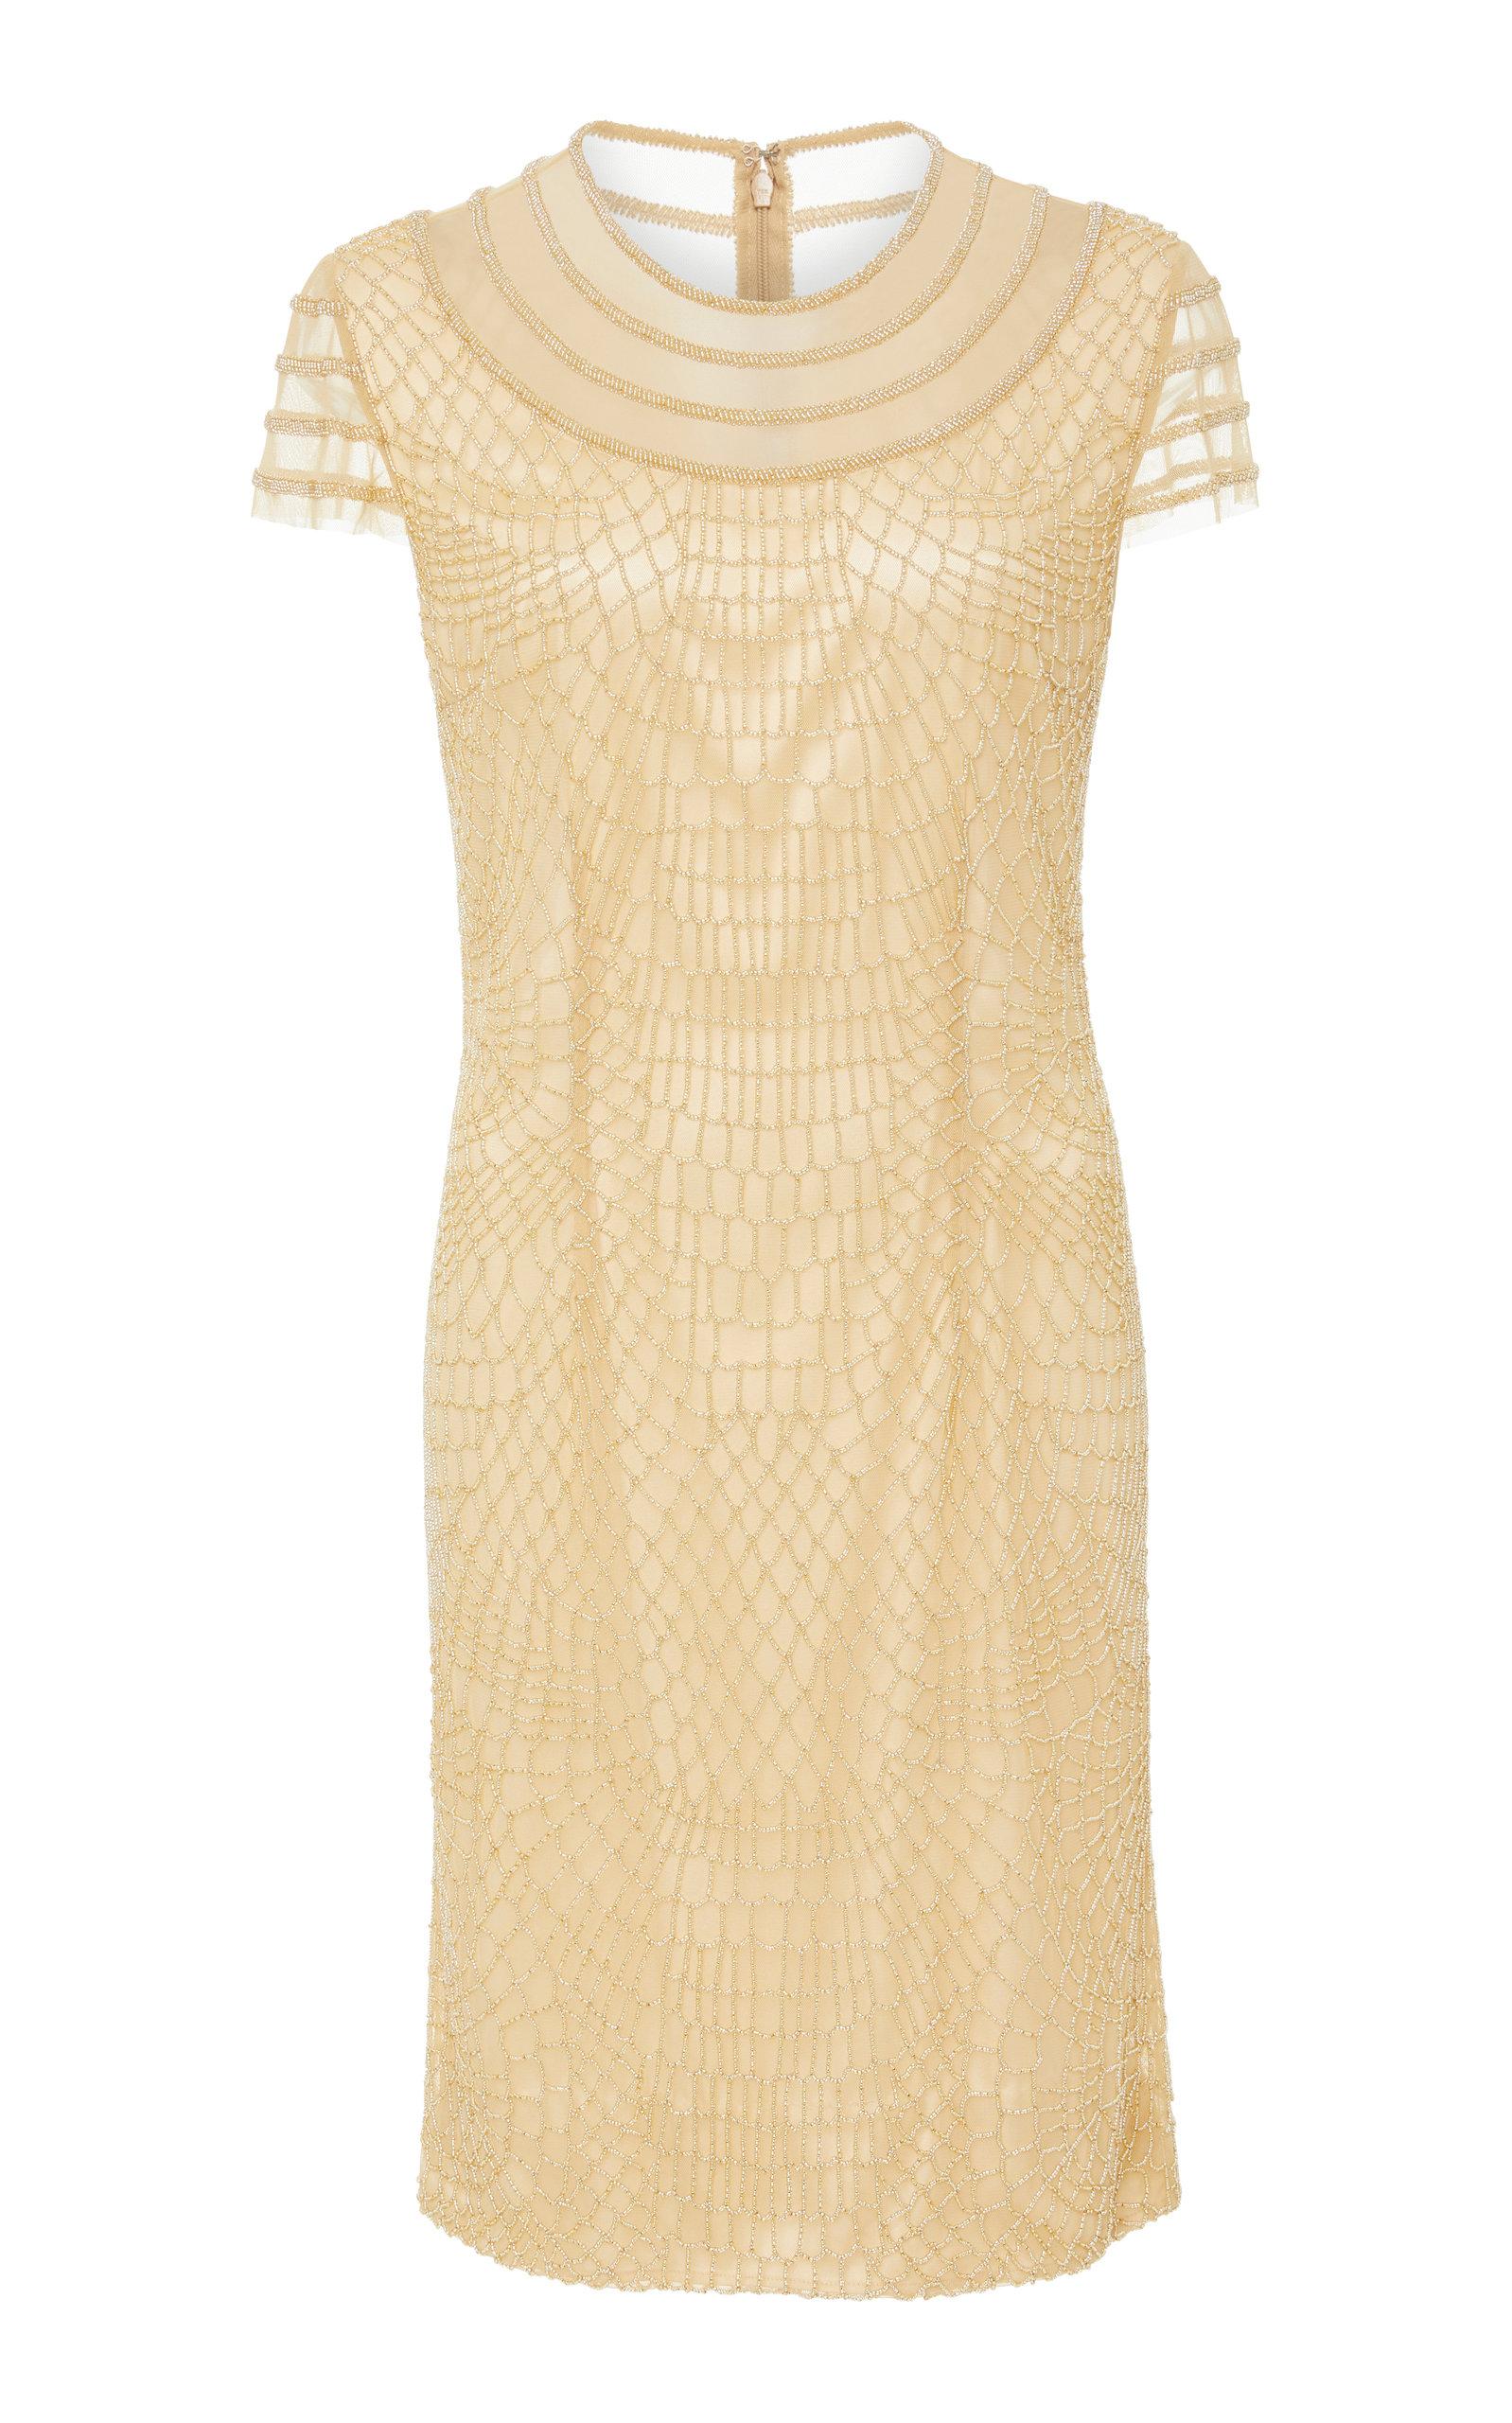 JOANNA MASTROIANNI GOLD WEB EMBROIDERED DRESS